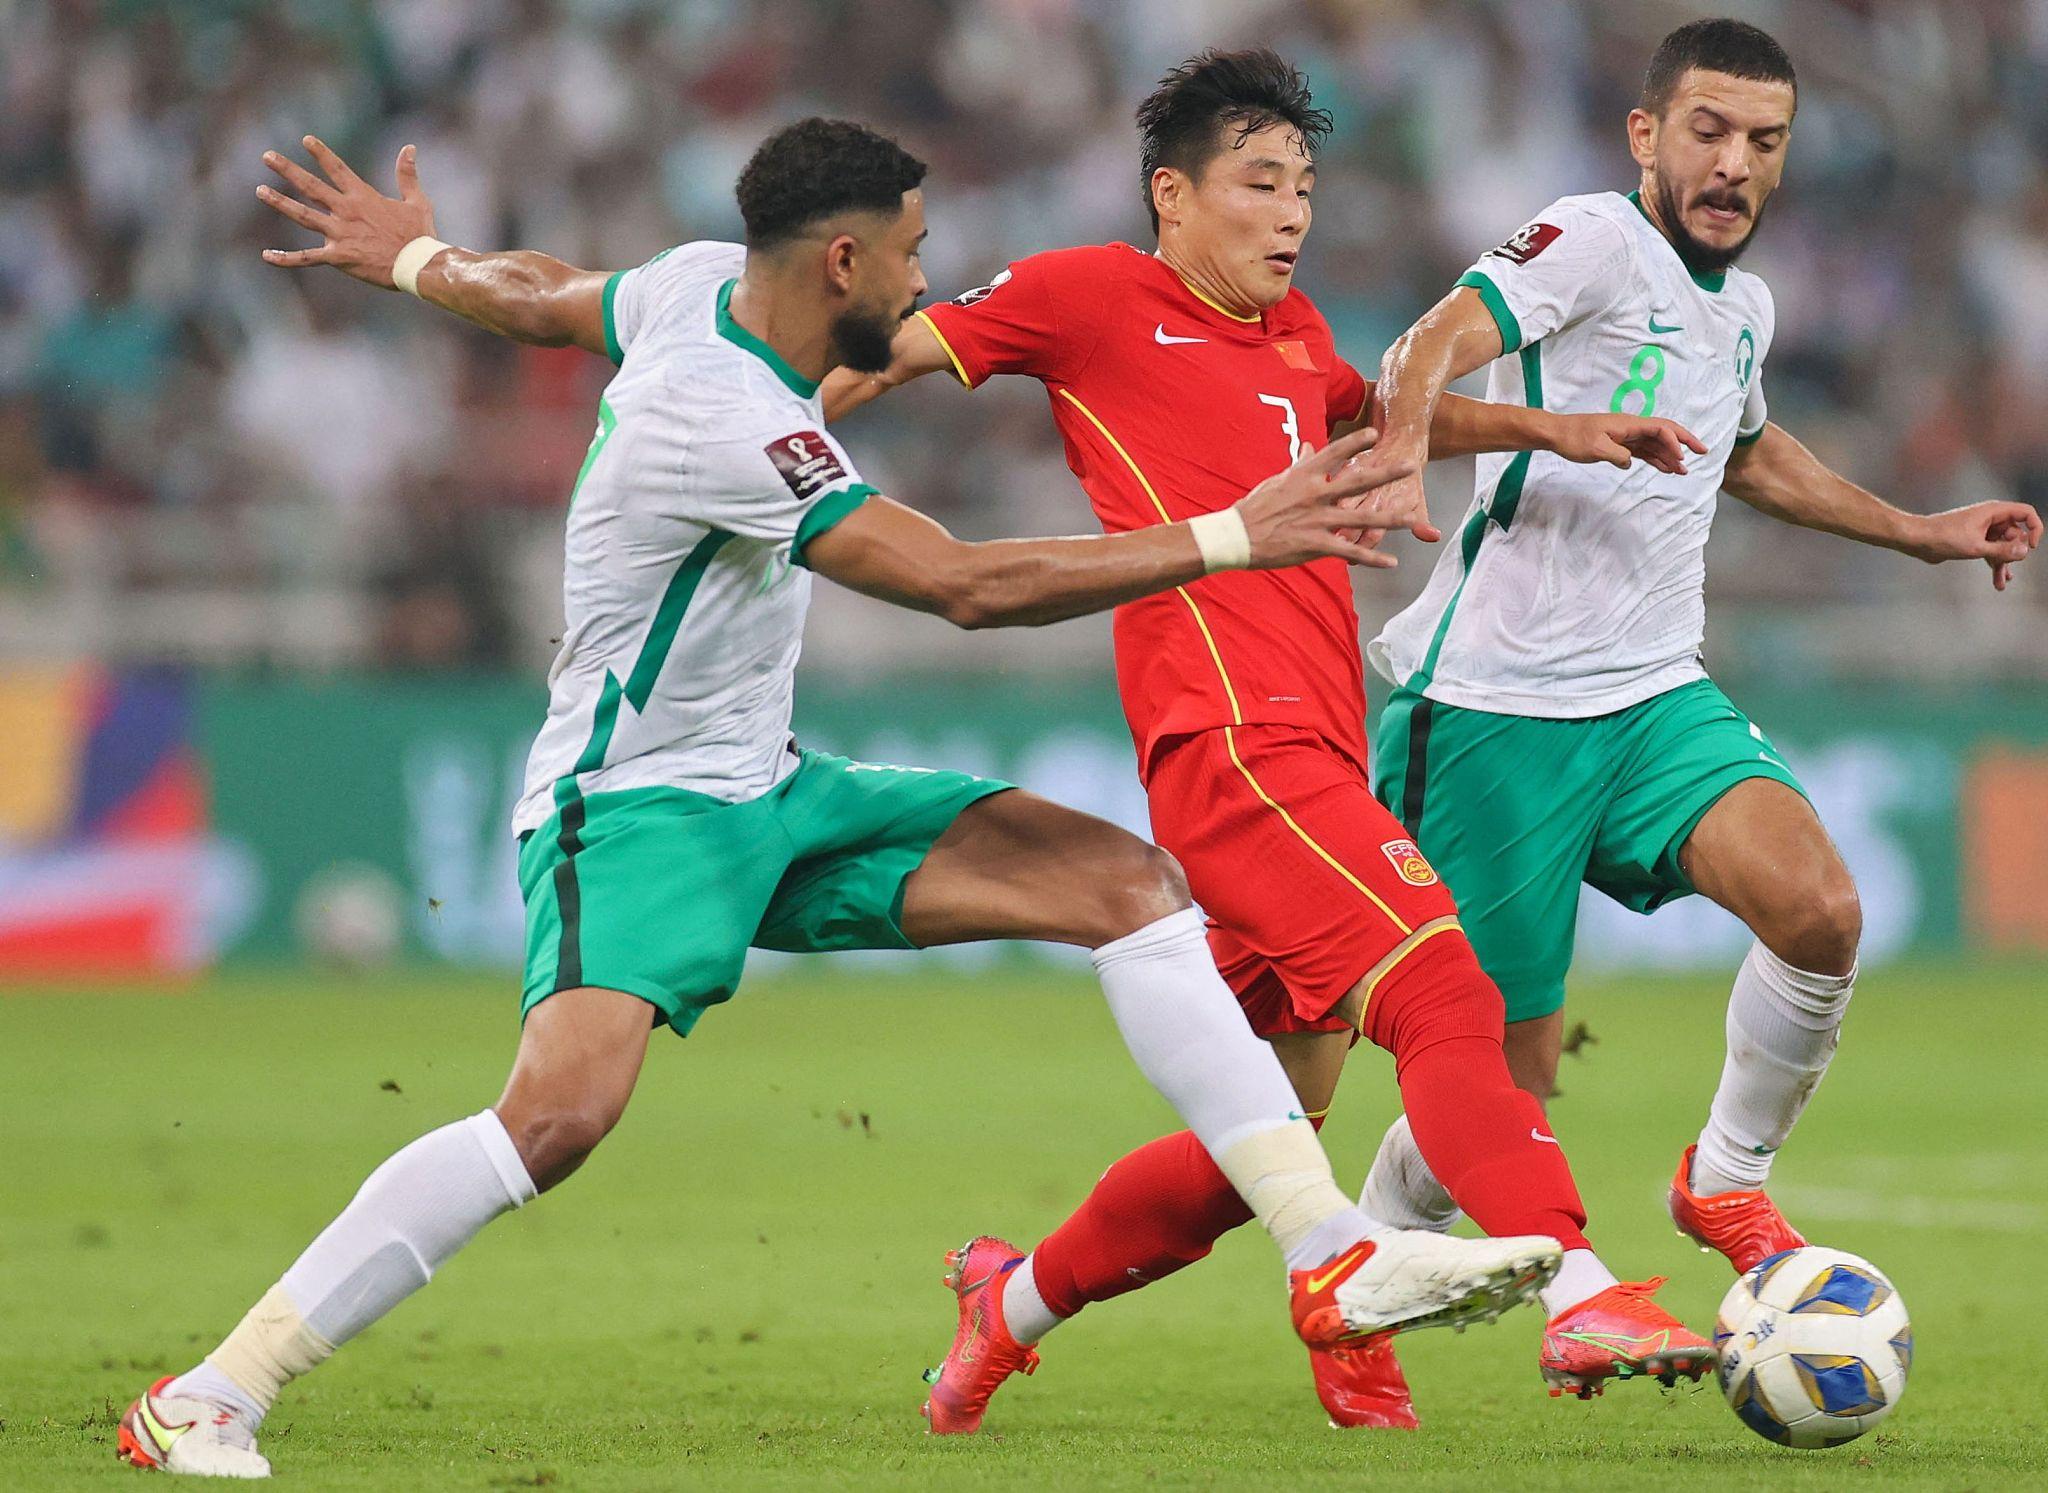 Saudi Arabia defeat China 3-2 in Qatar 2022 World Cup qualifiers